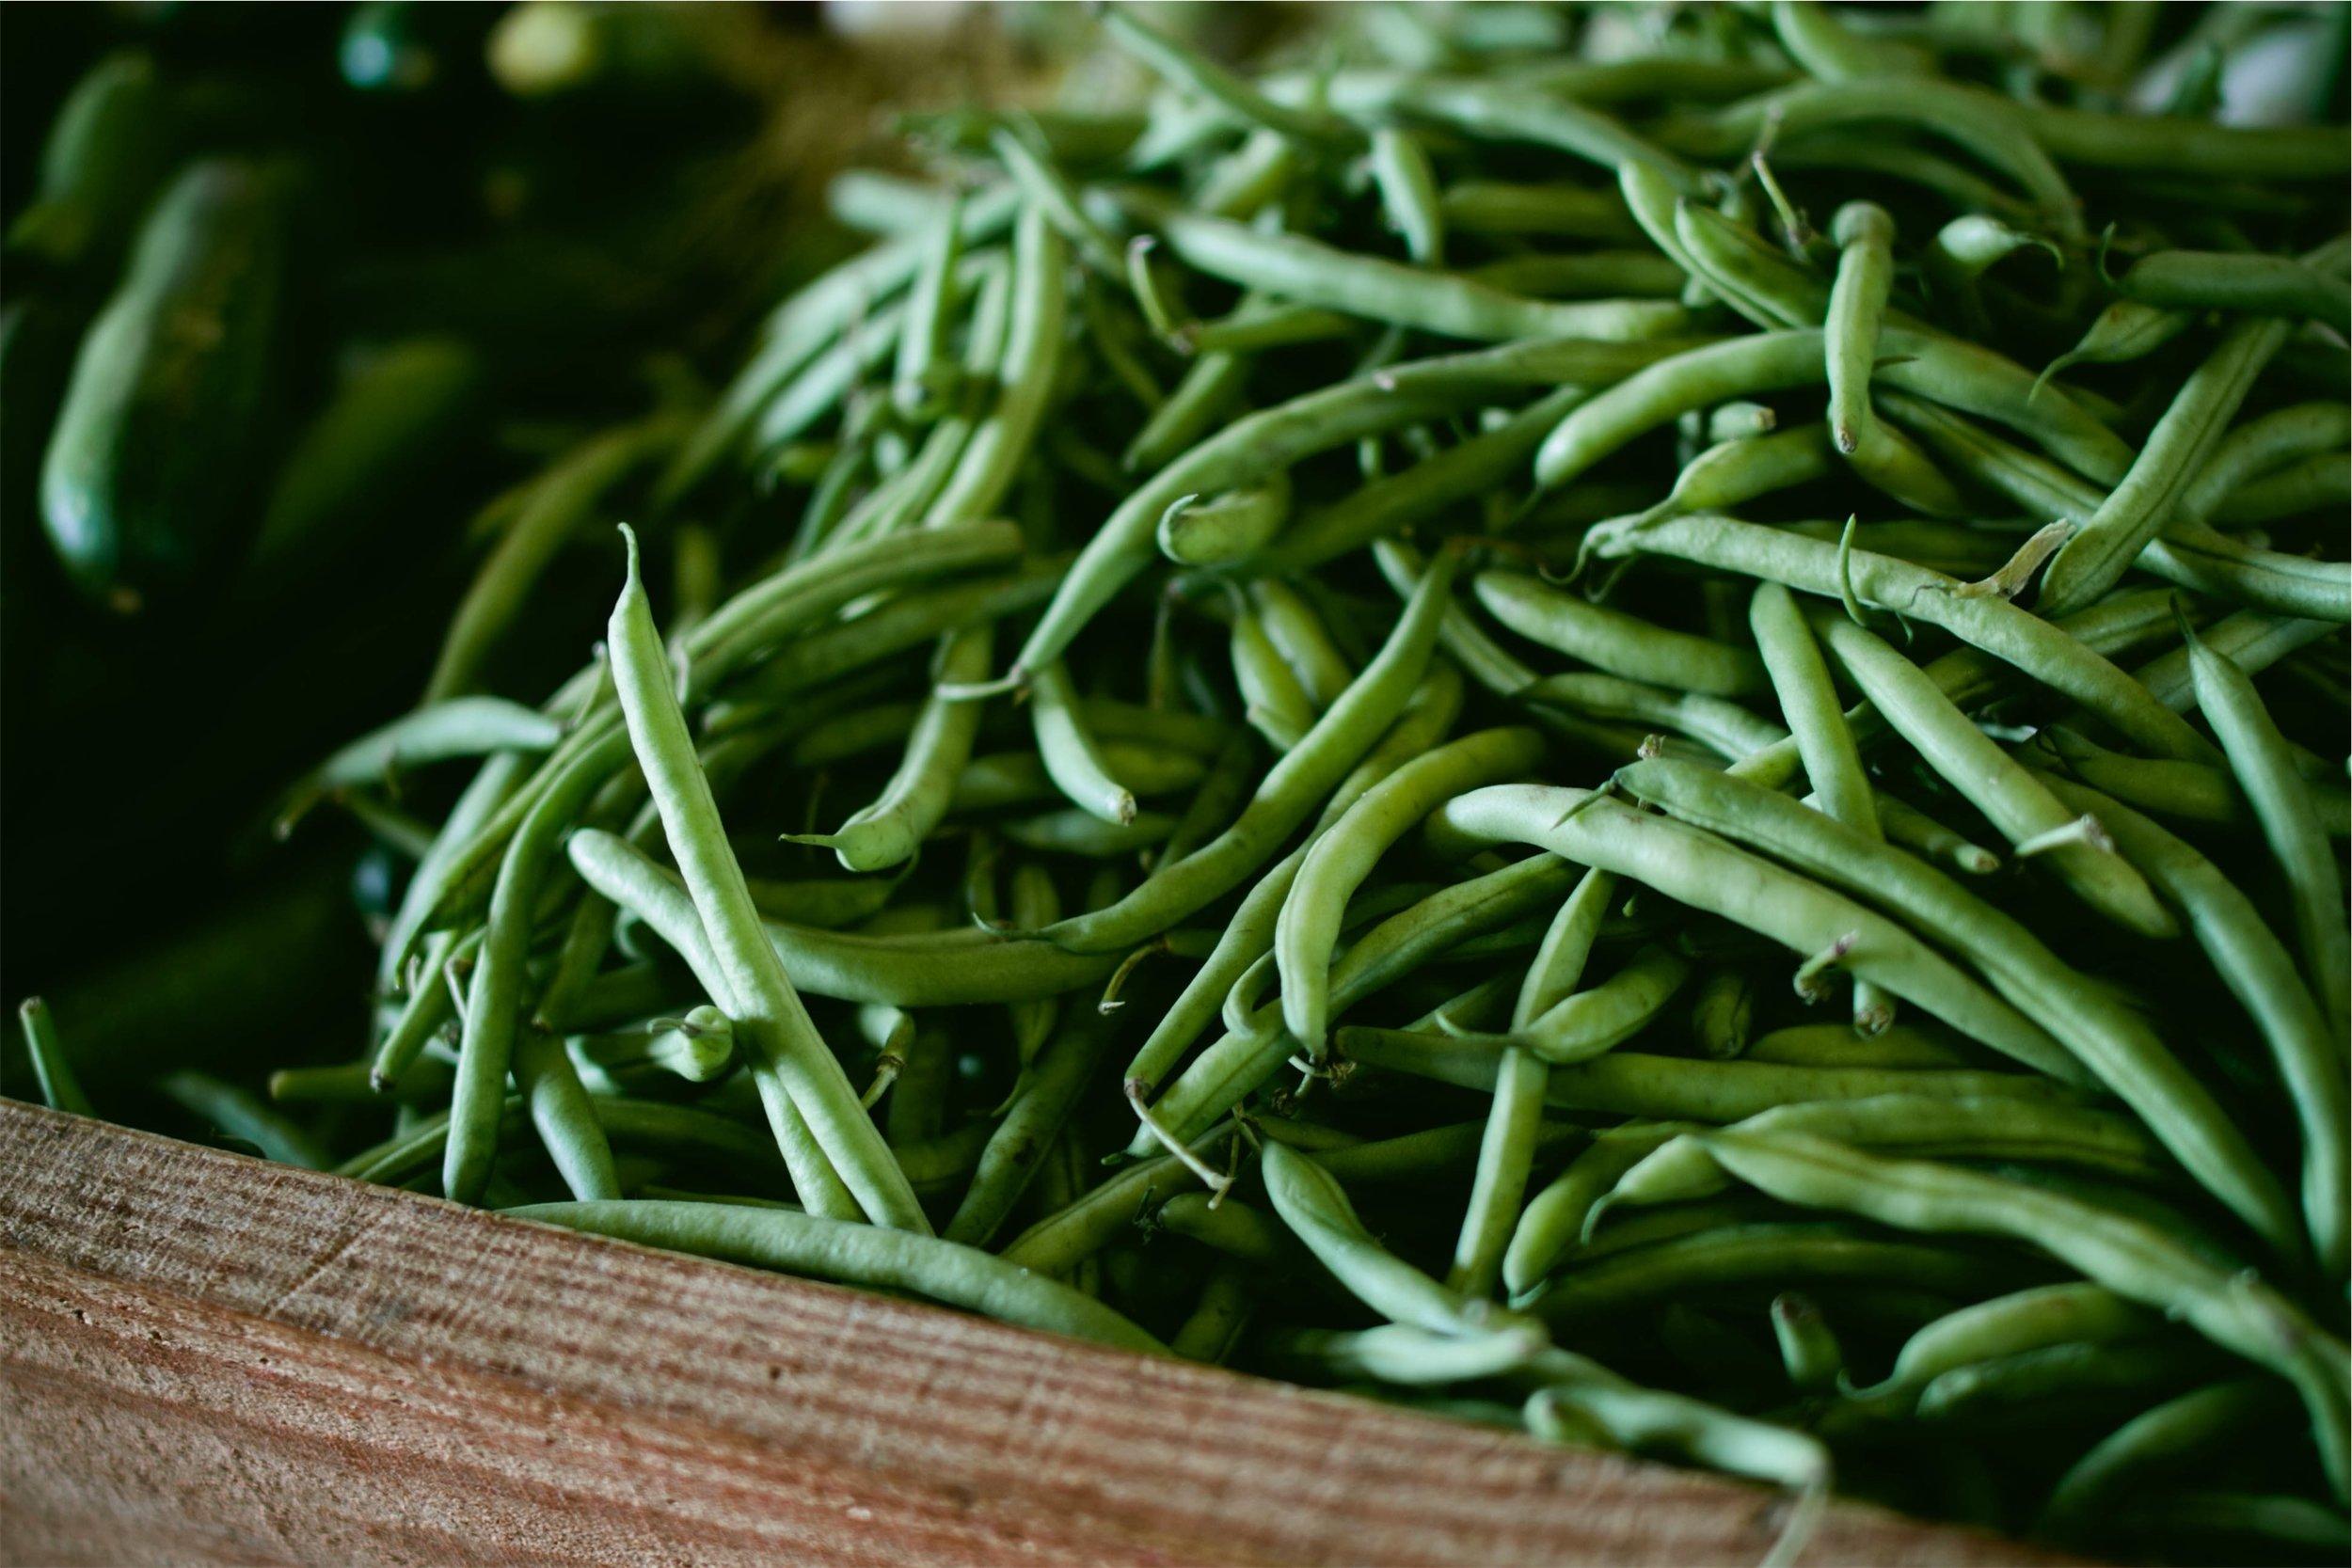 Green Beans_Sonja Langford_Unsplash Photo.jpg